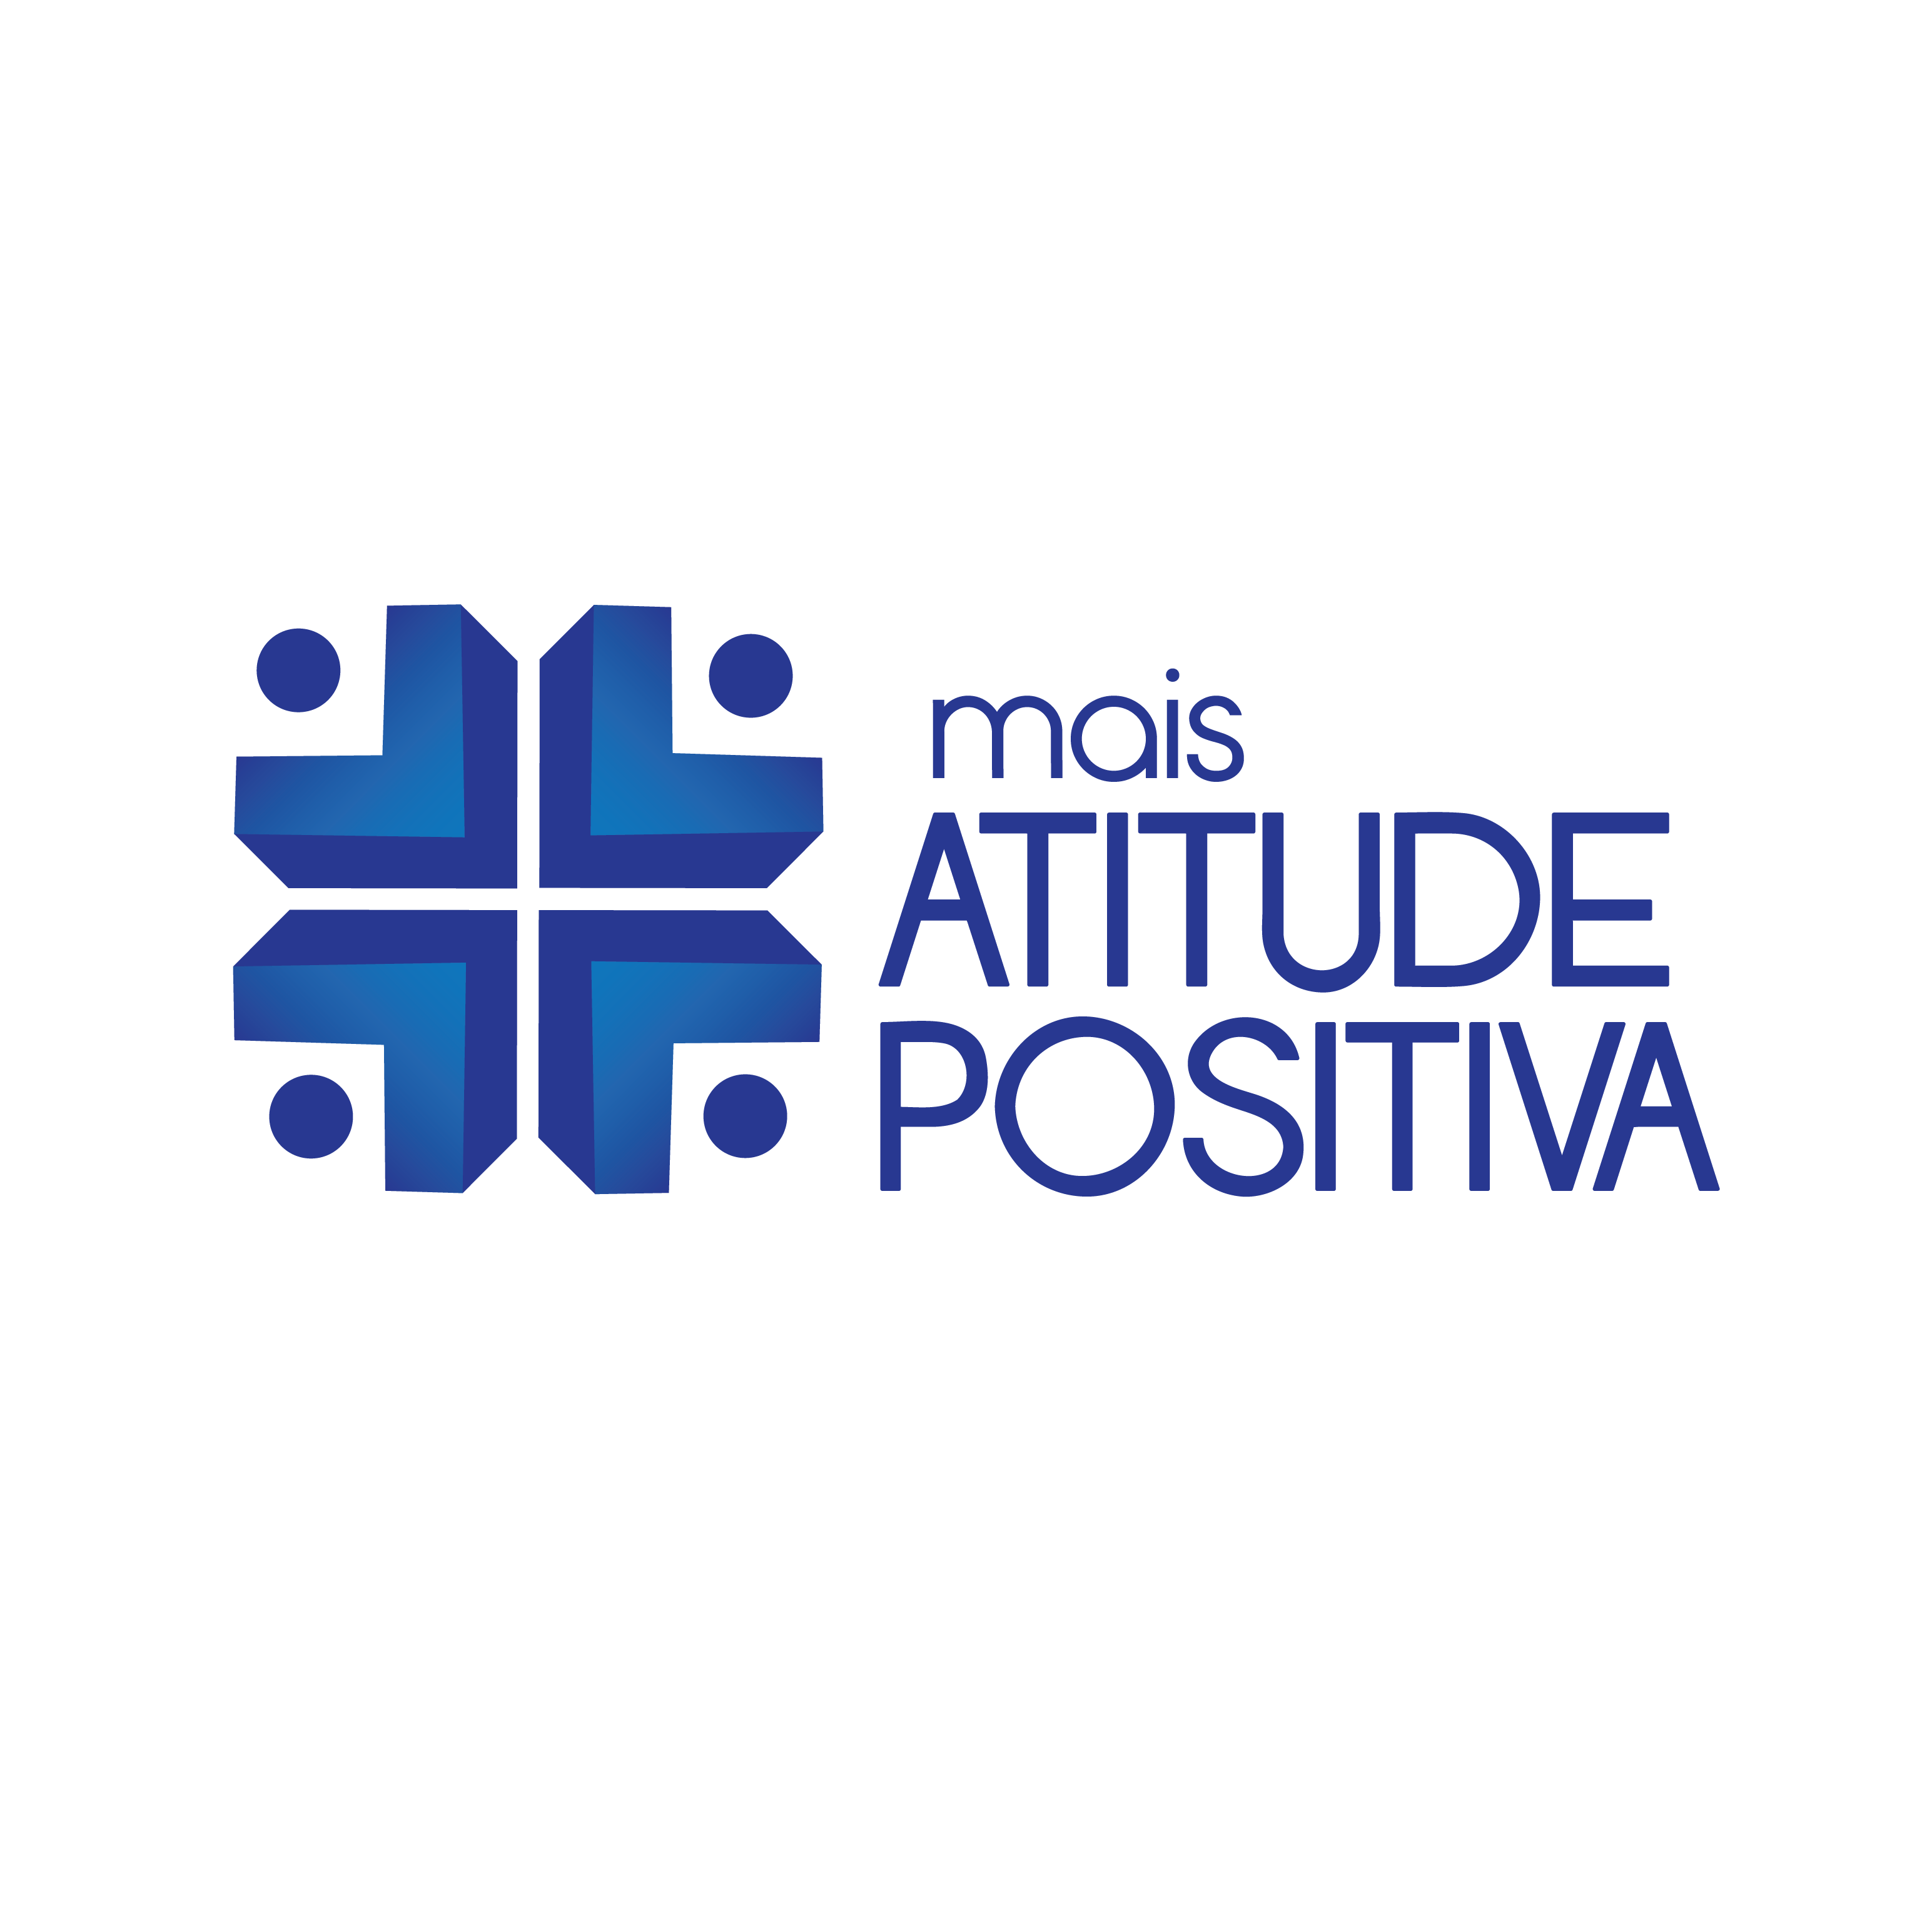 Atitudepositivalogosemfundo-01.png